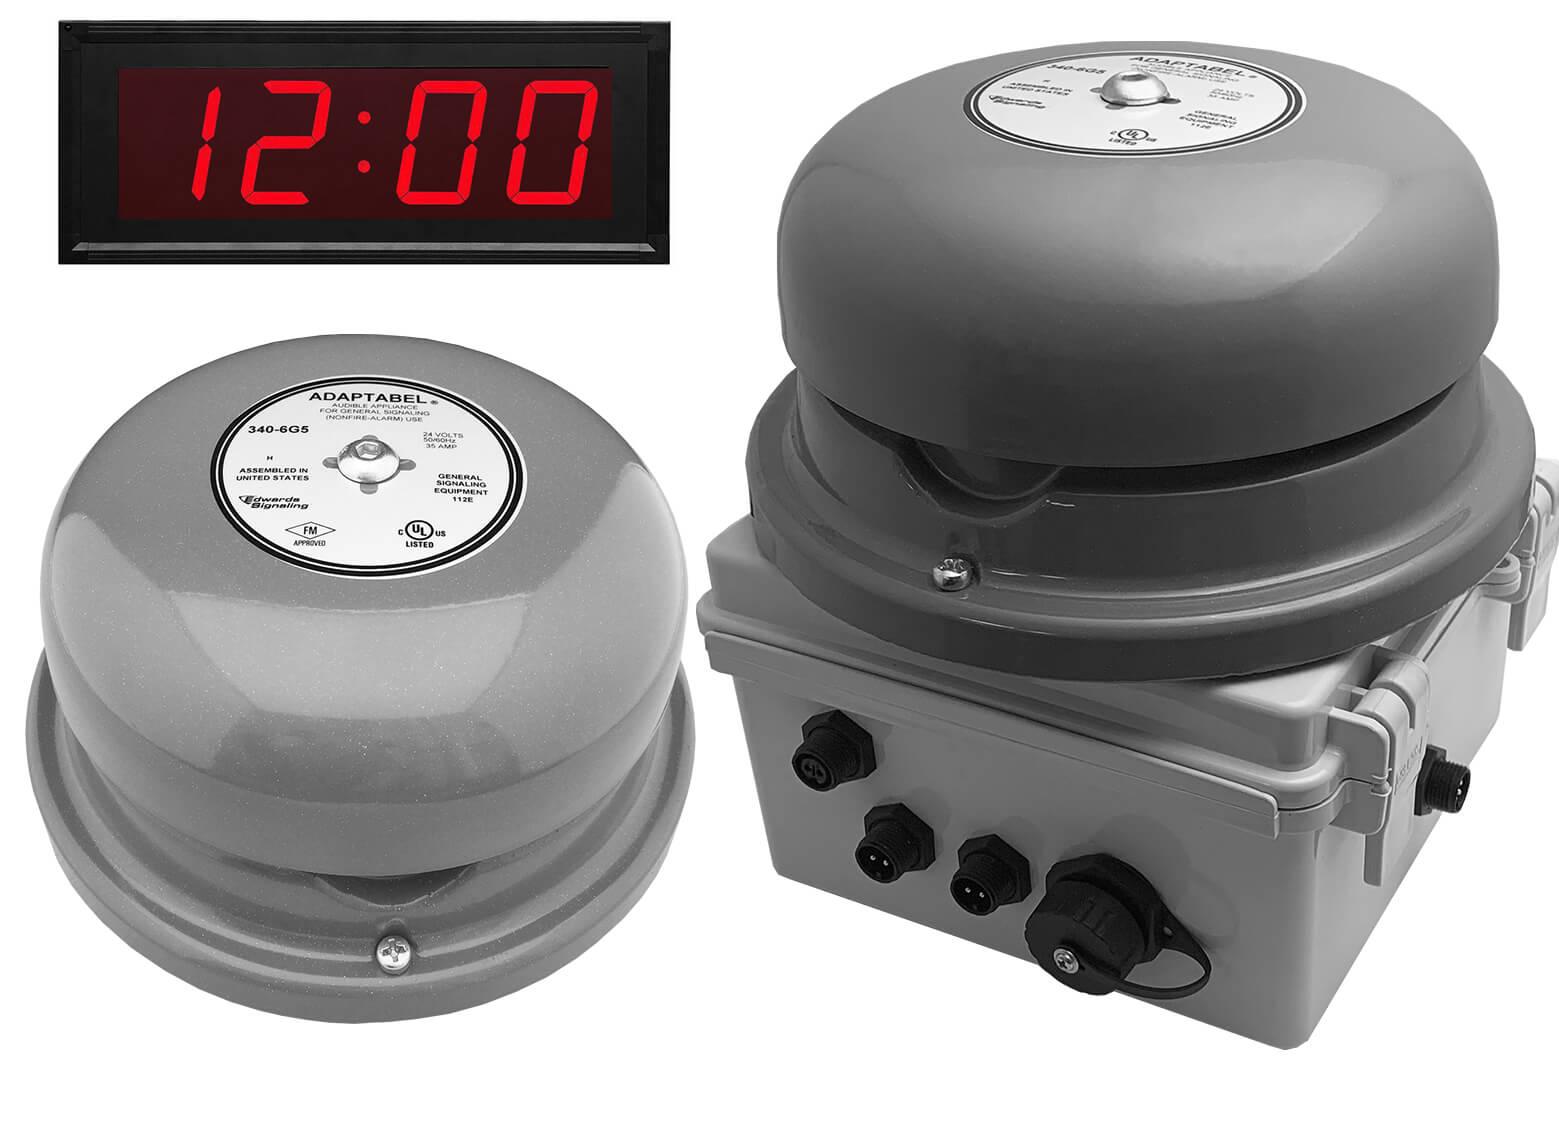 Netbell-KL-E1-C Network All-in-One Extra Loud Break Bell Clock System (2 Bells System)